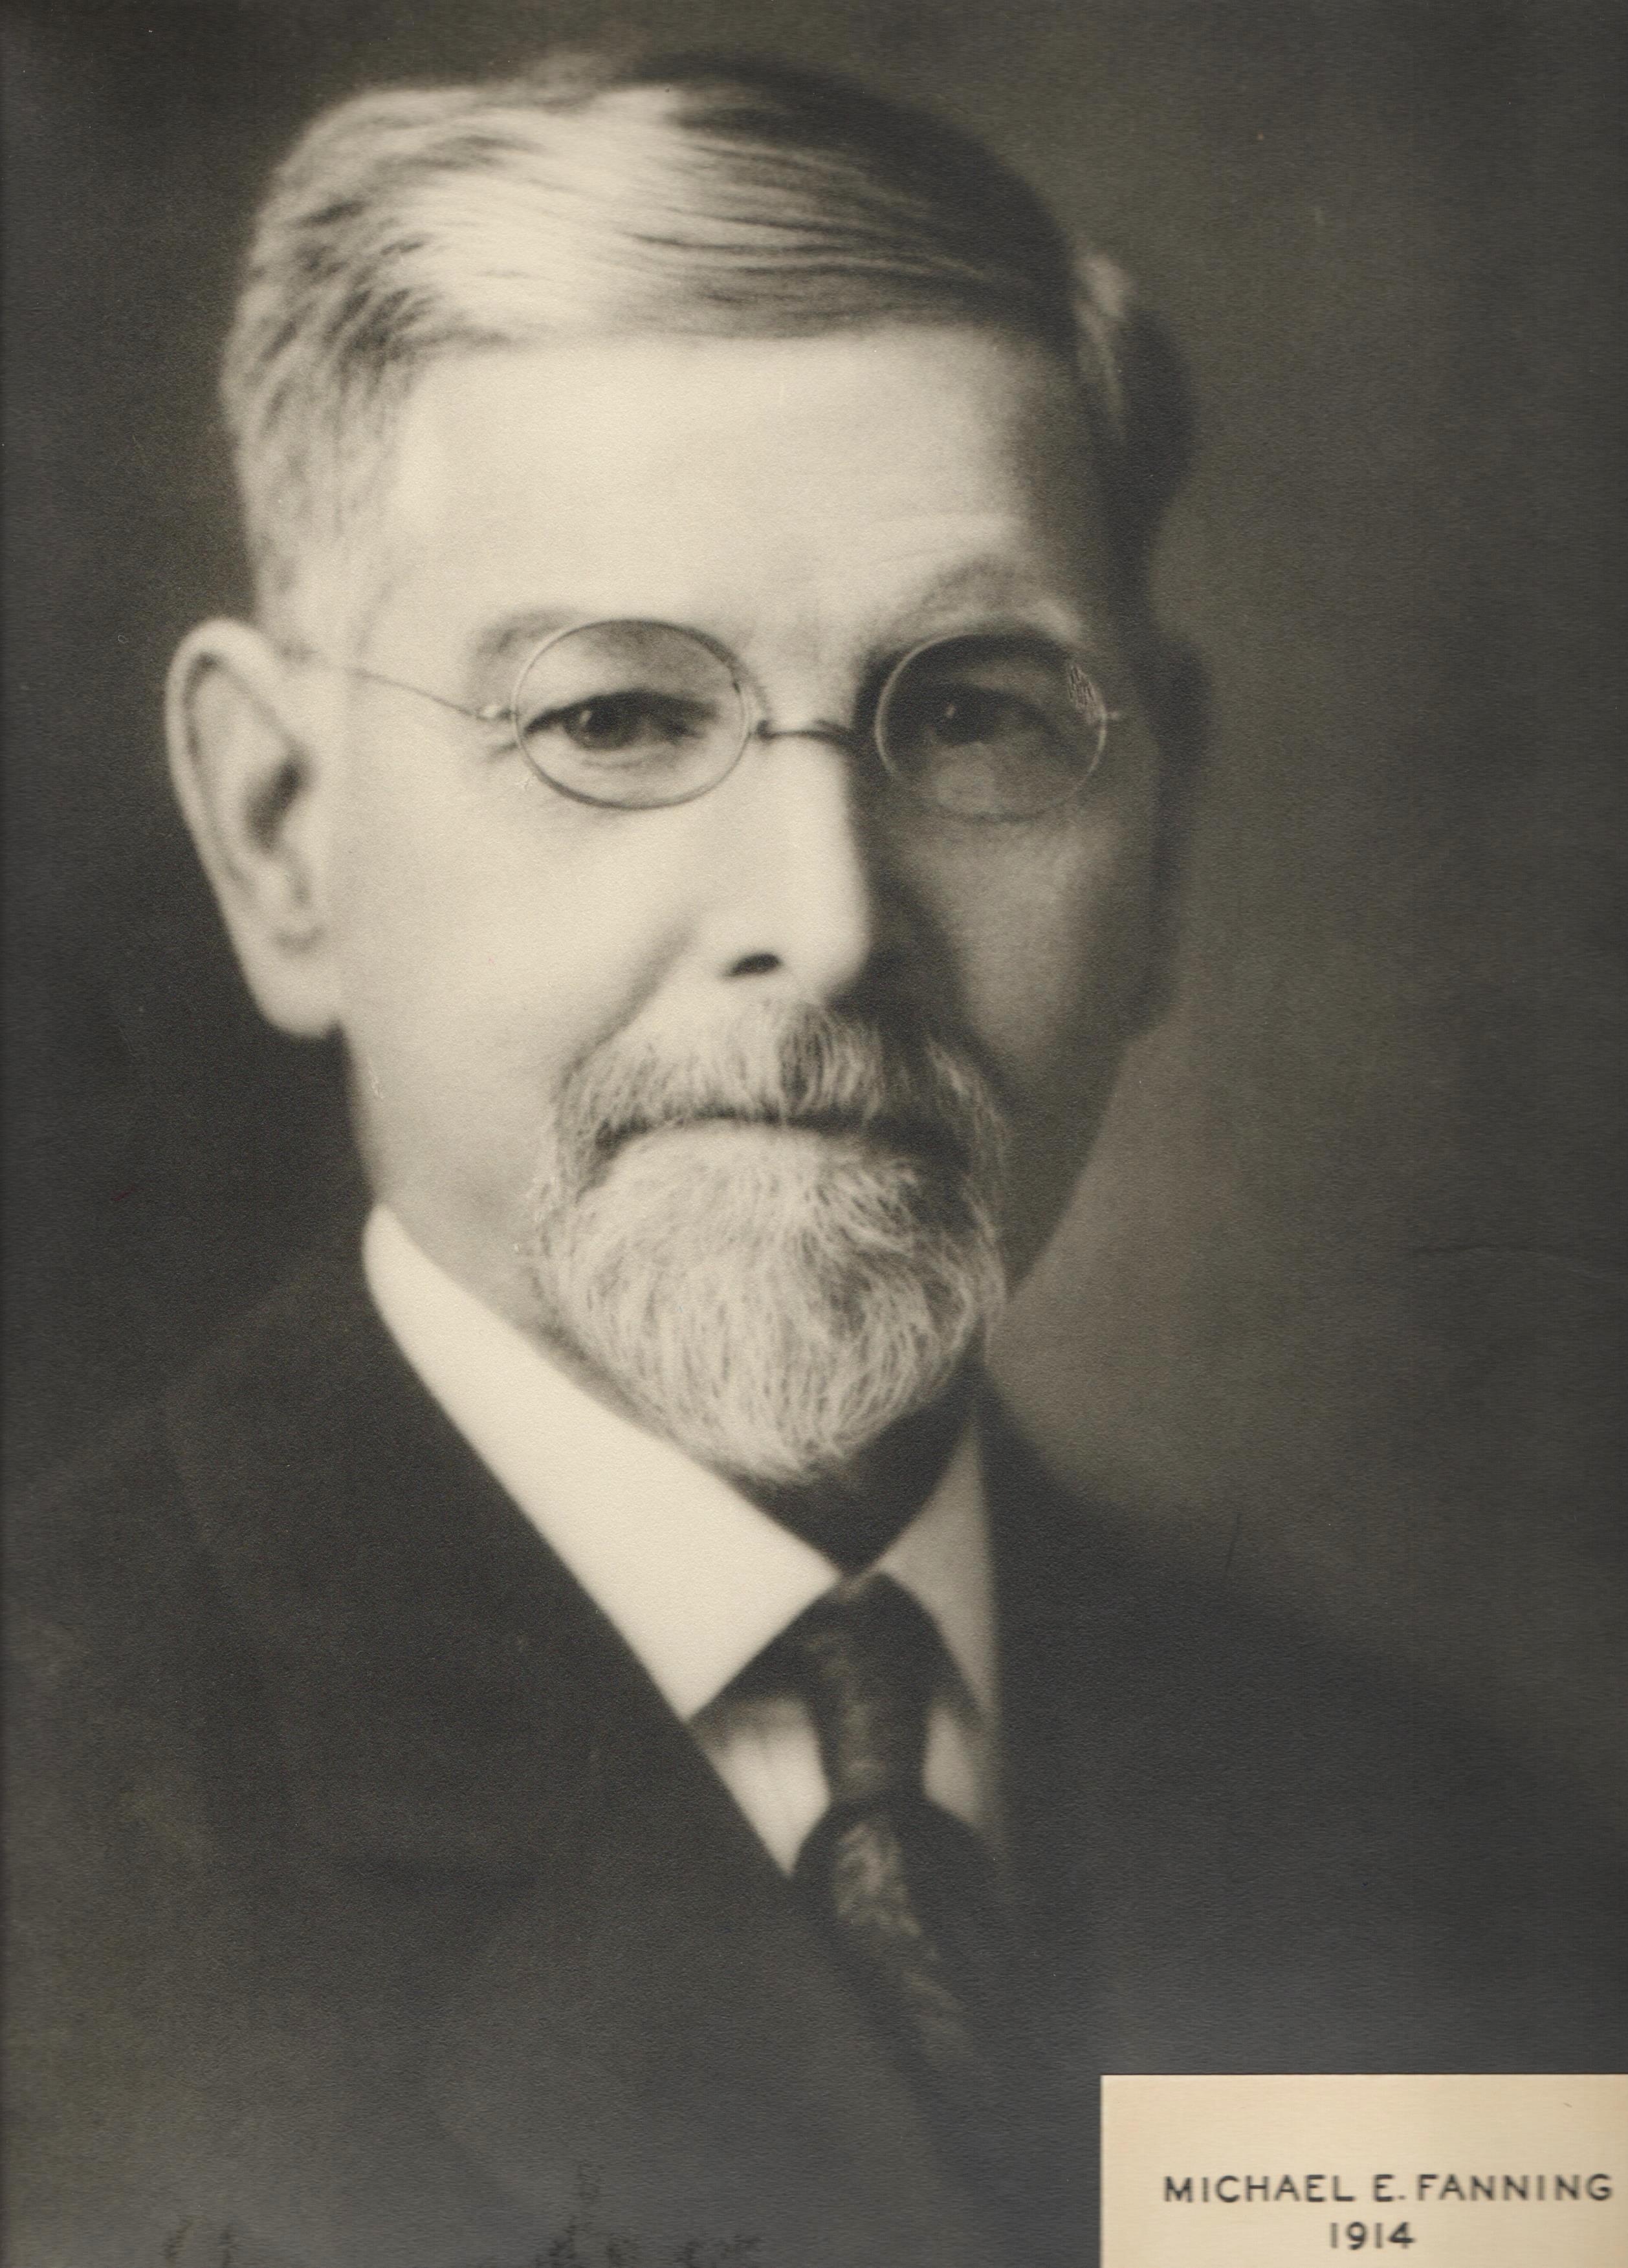 1914 Michael E. Fanning